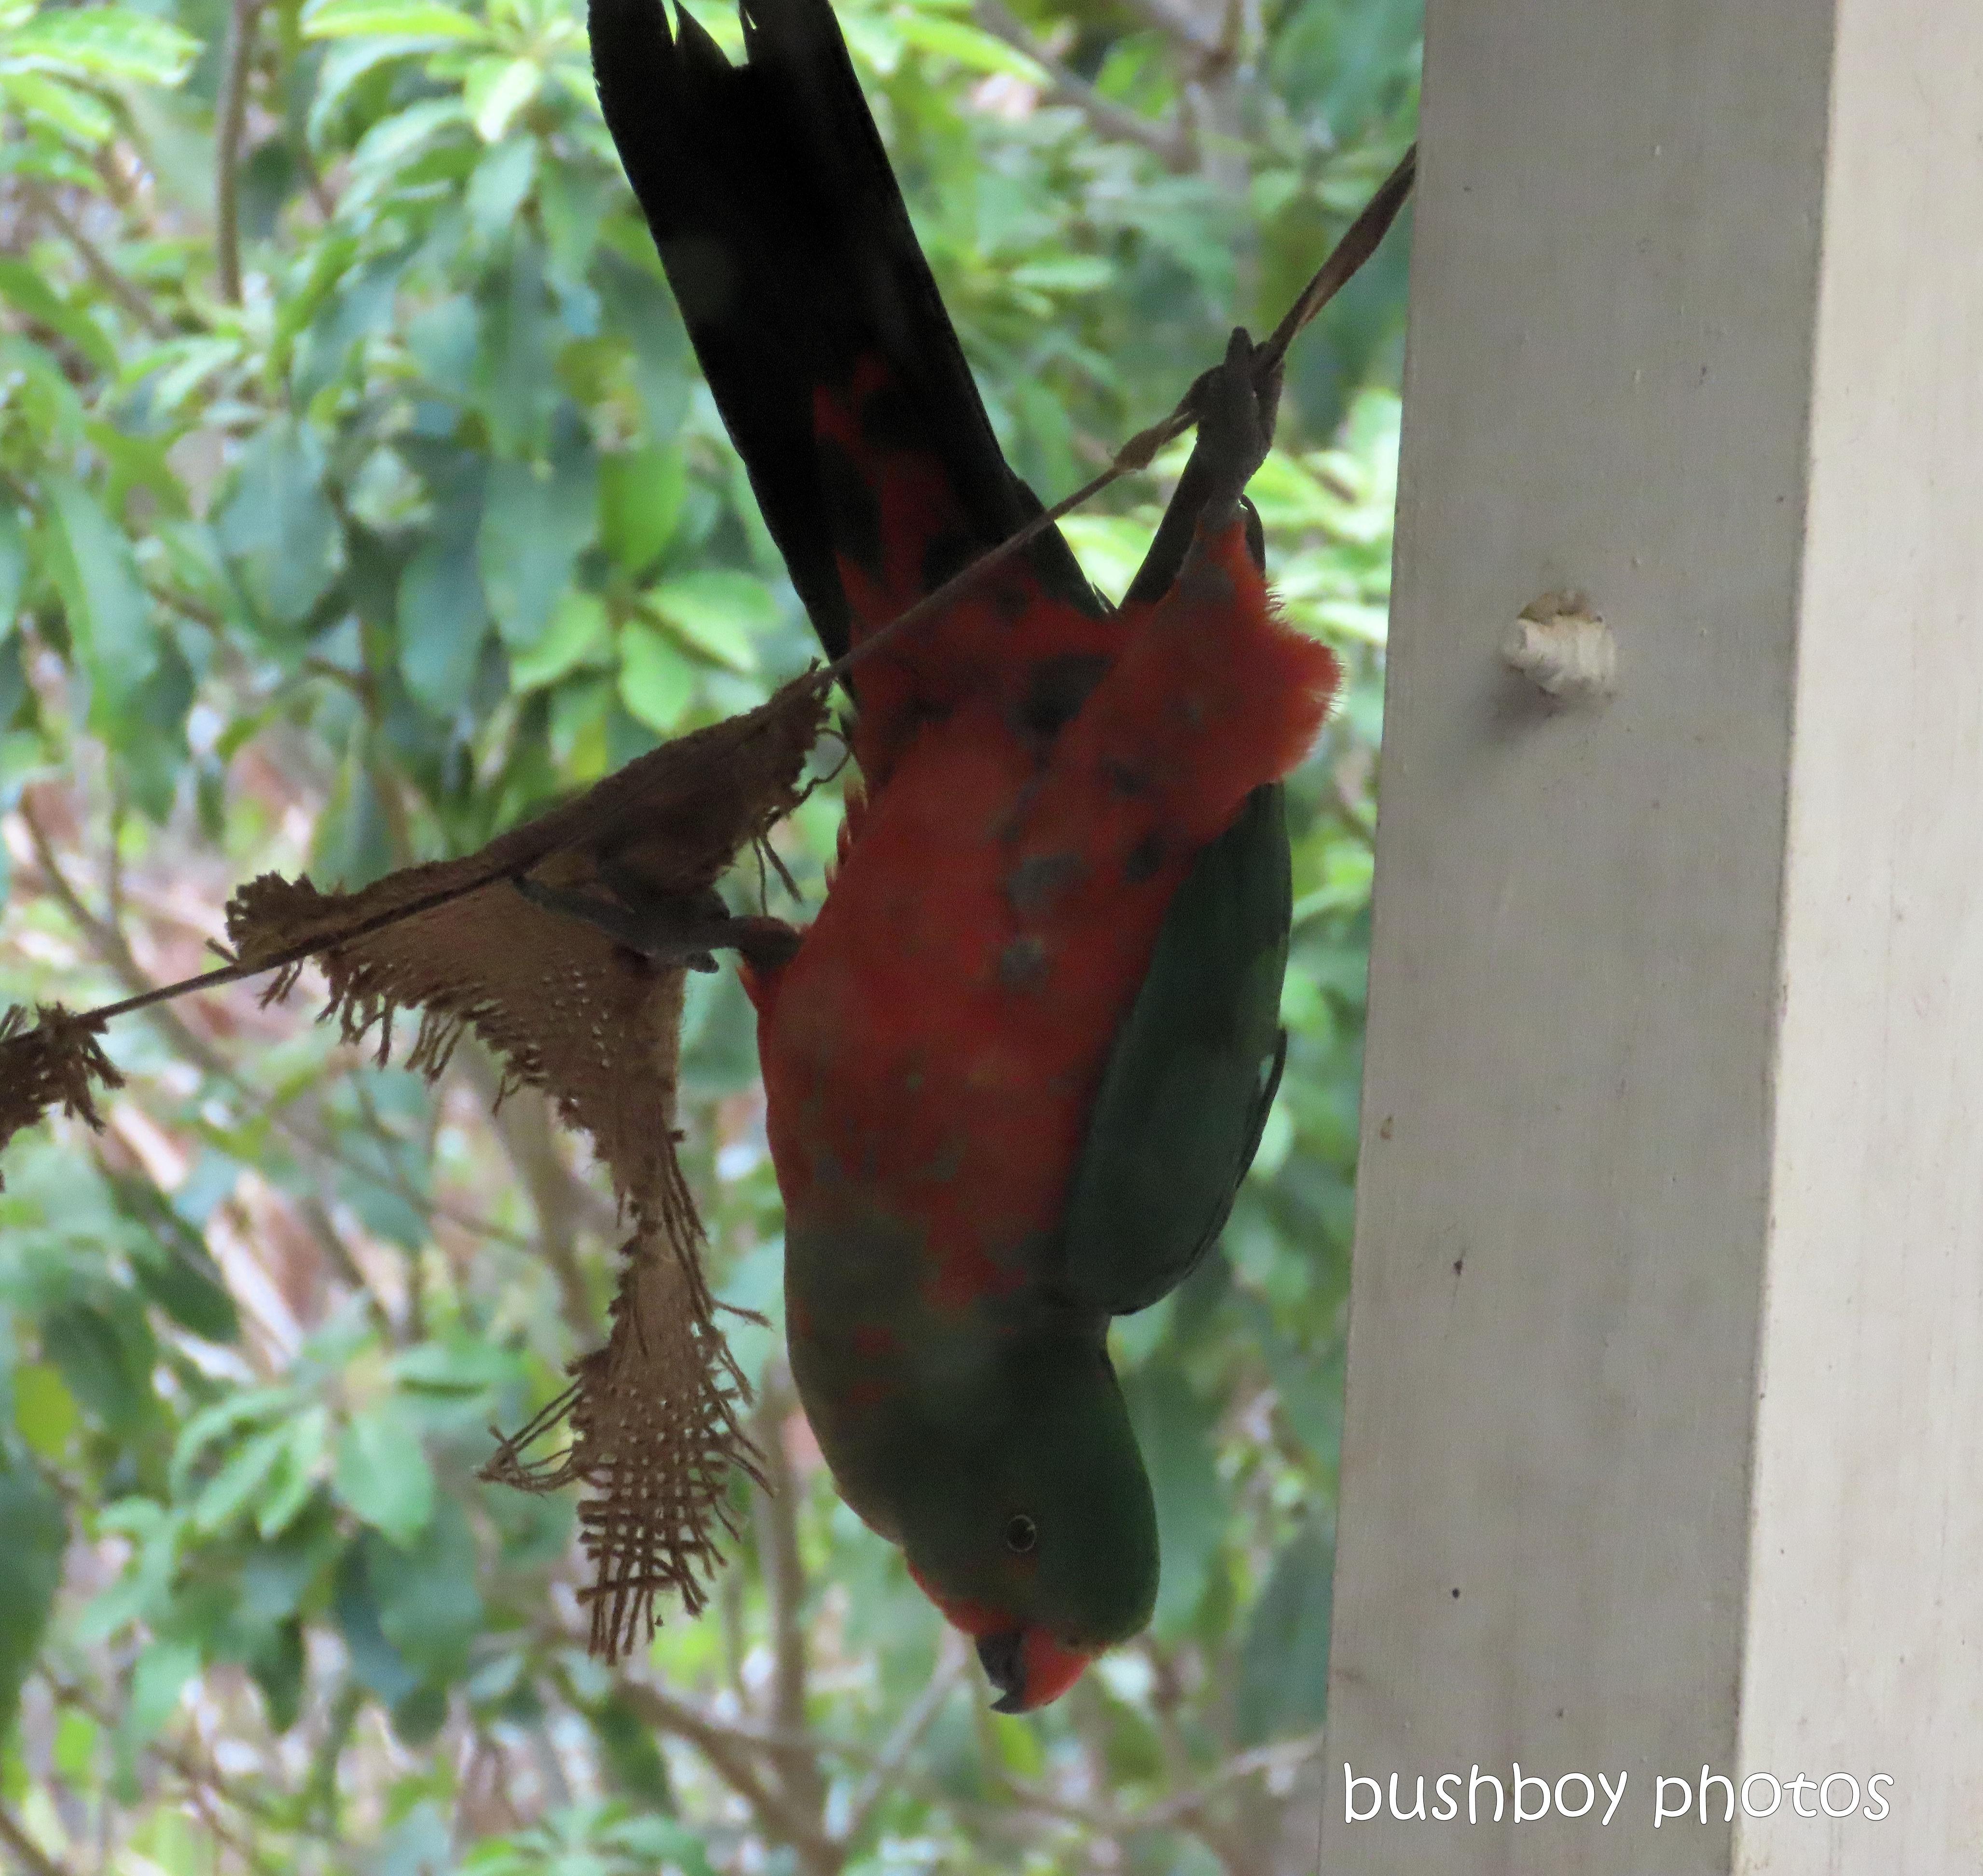 king parrot_acrobat_fun_named_home_jackadgery_dec 2019